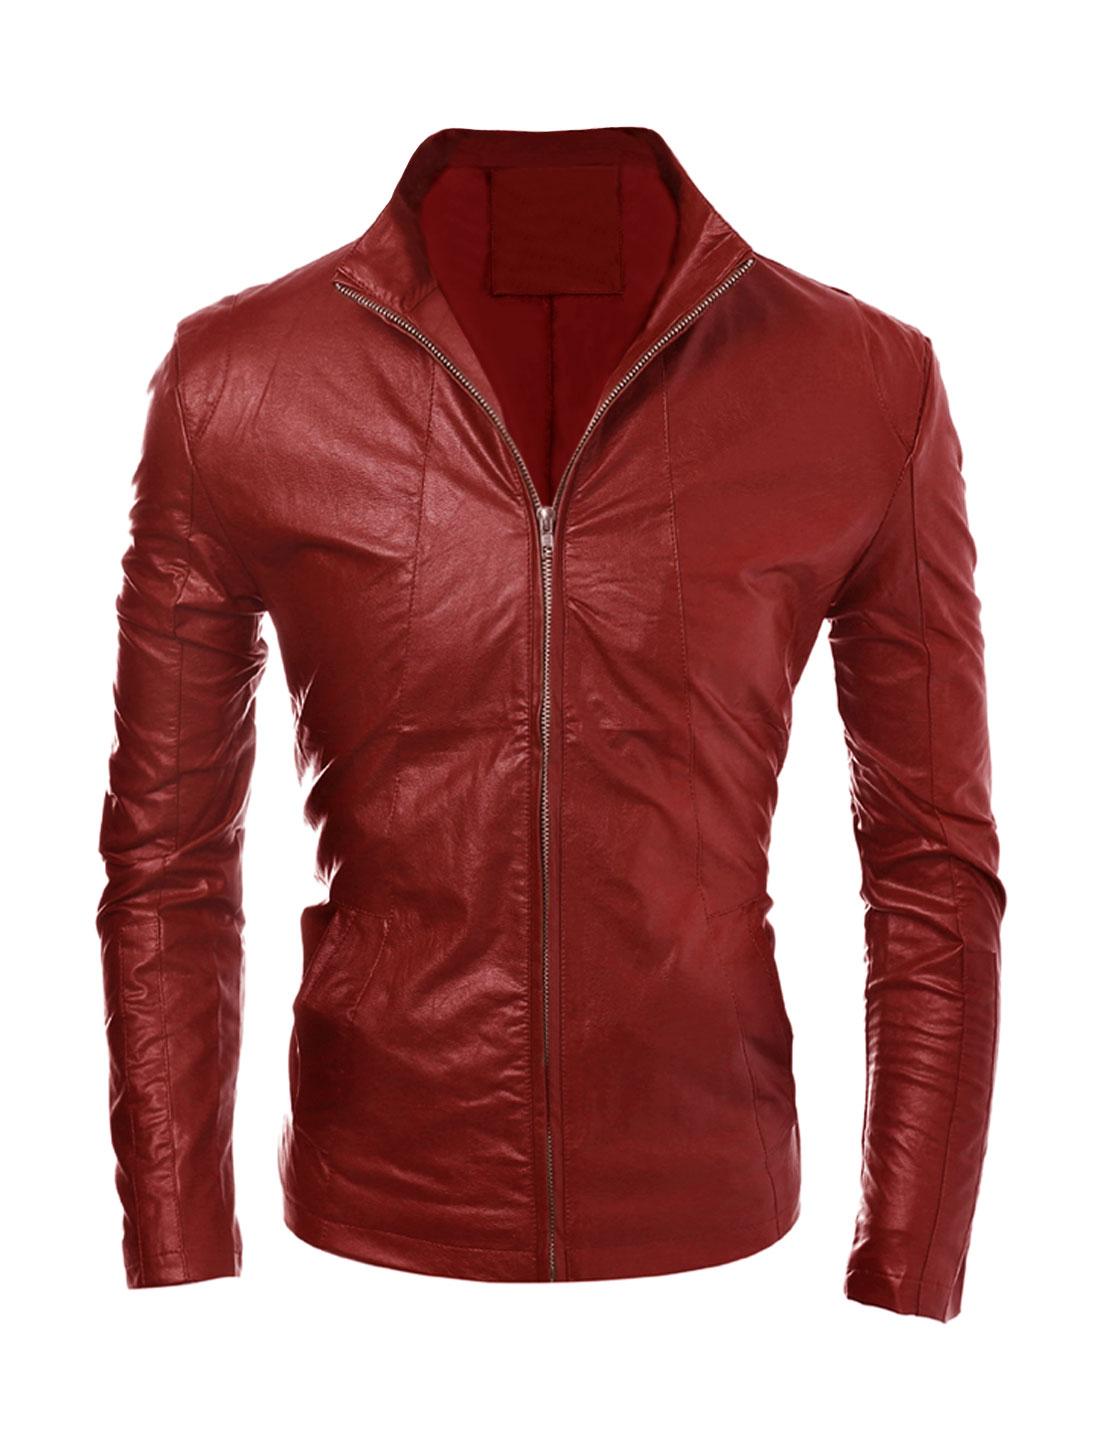 Men Side Pockets Stand Collar Zippered Cuffs PU Jacket Red M